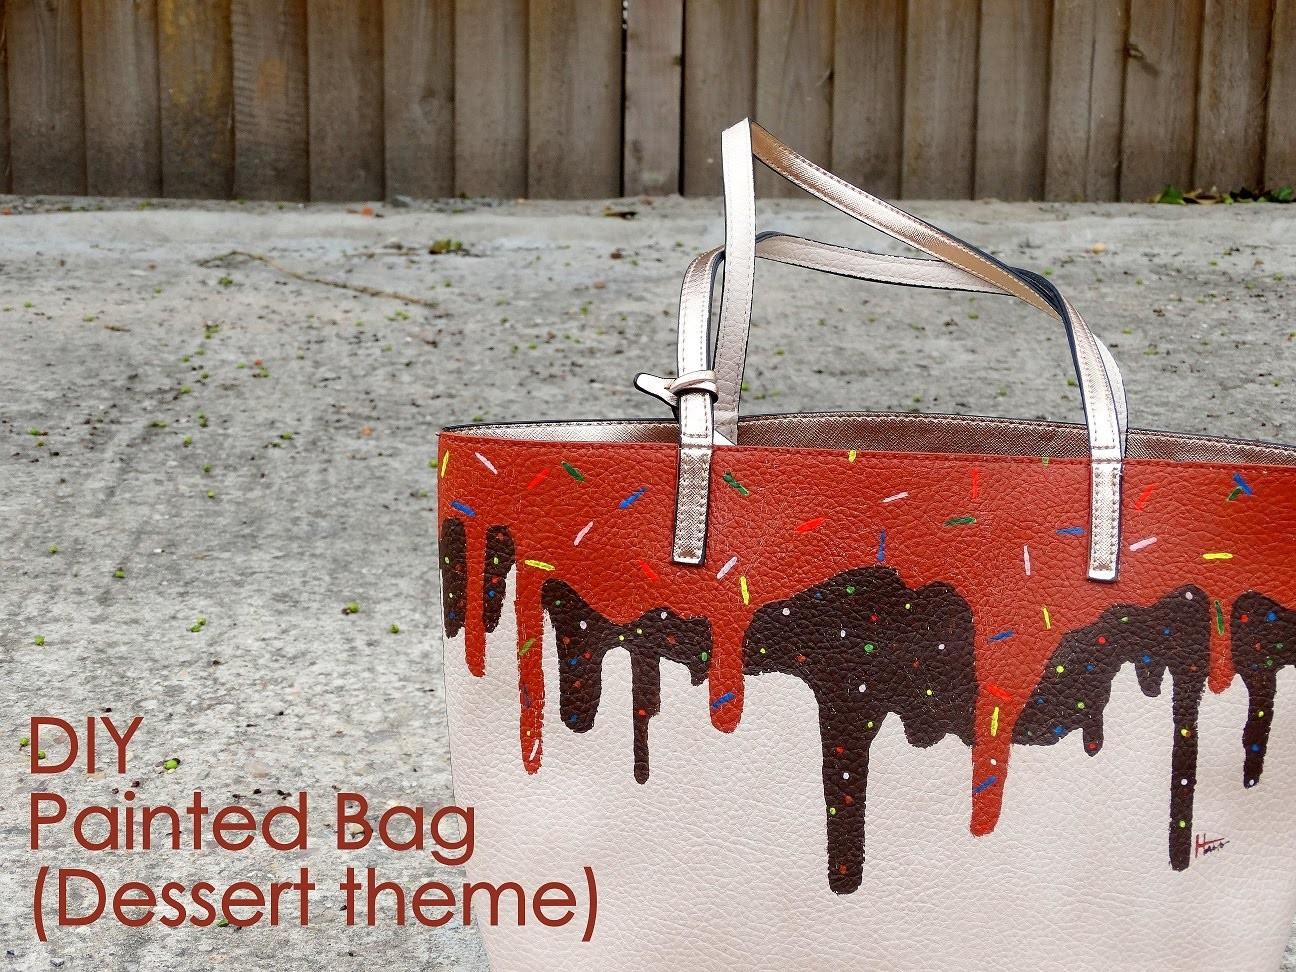 DIY- Painted Bag (Dessert theme)